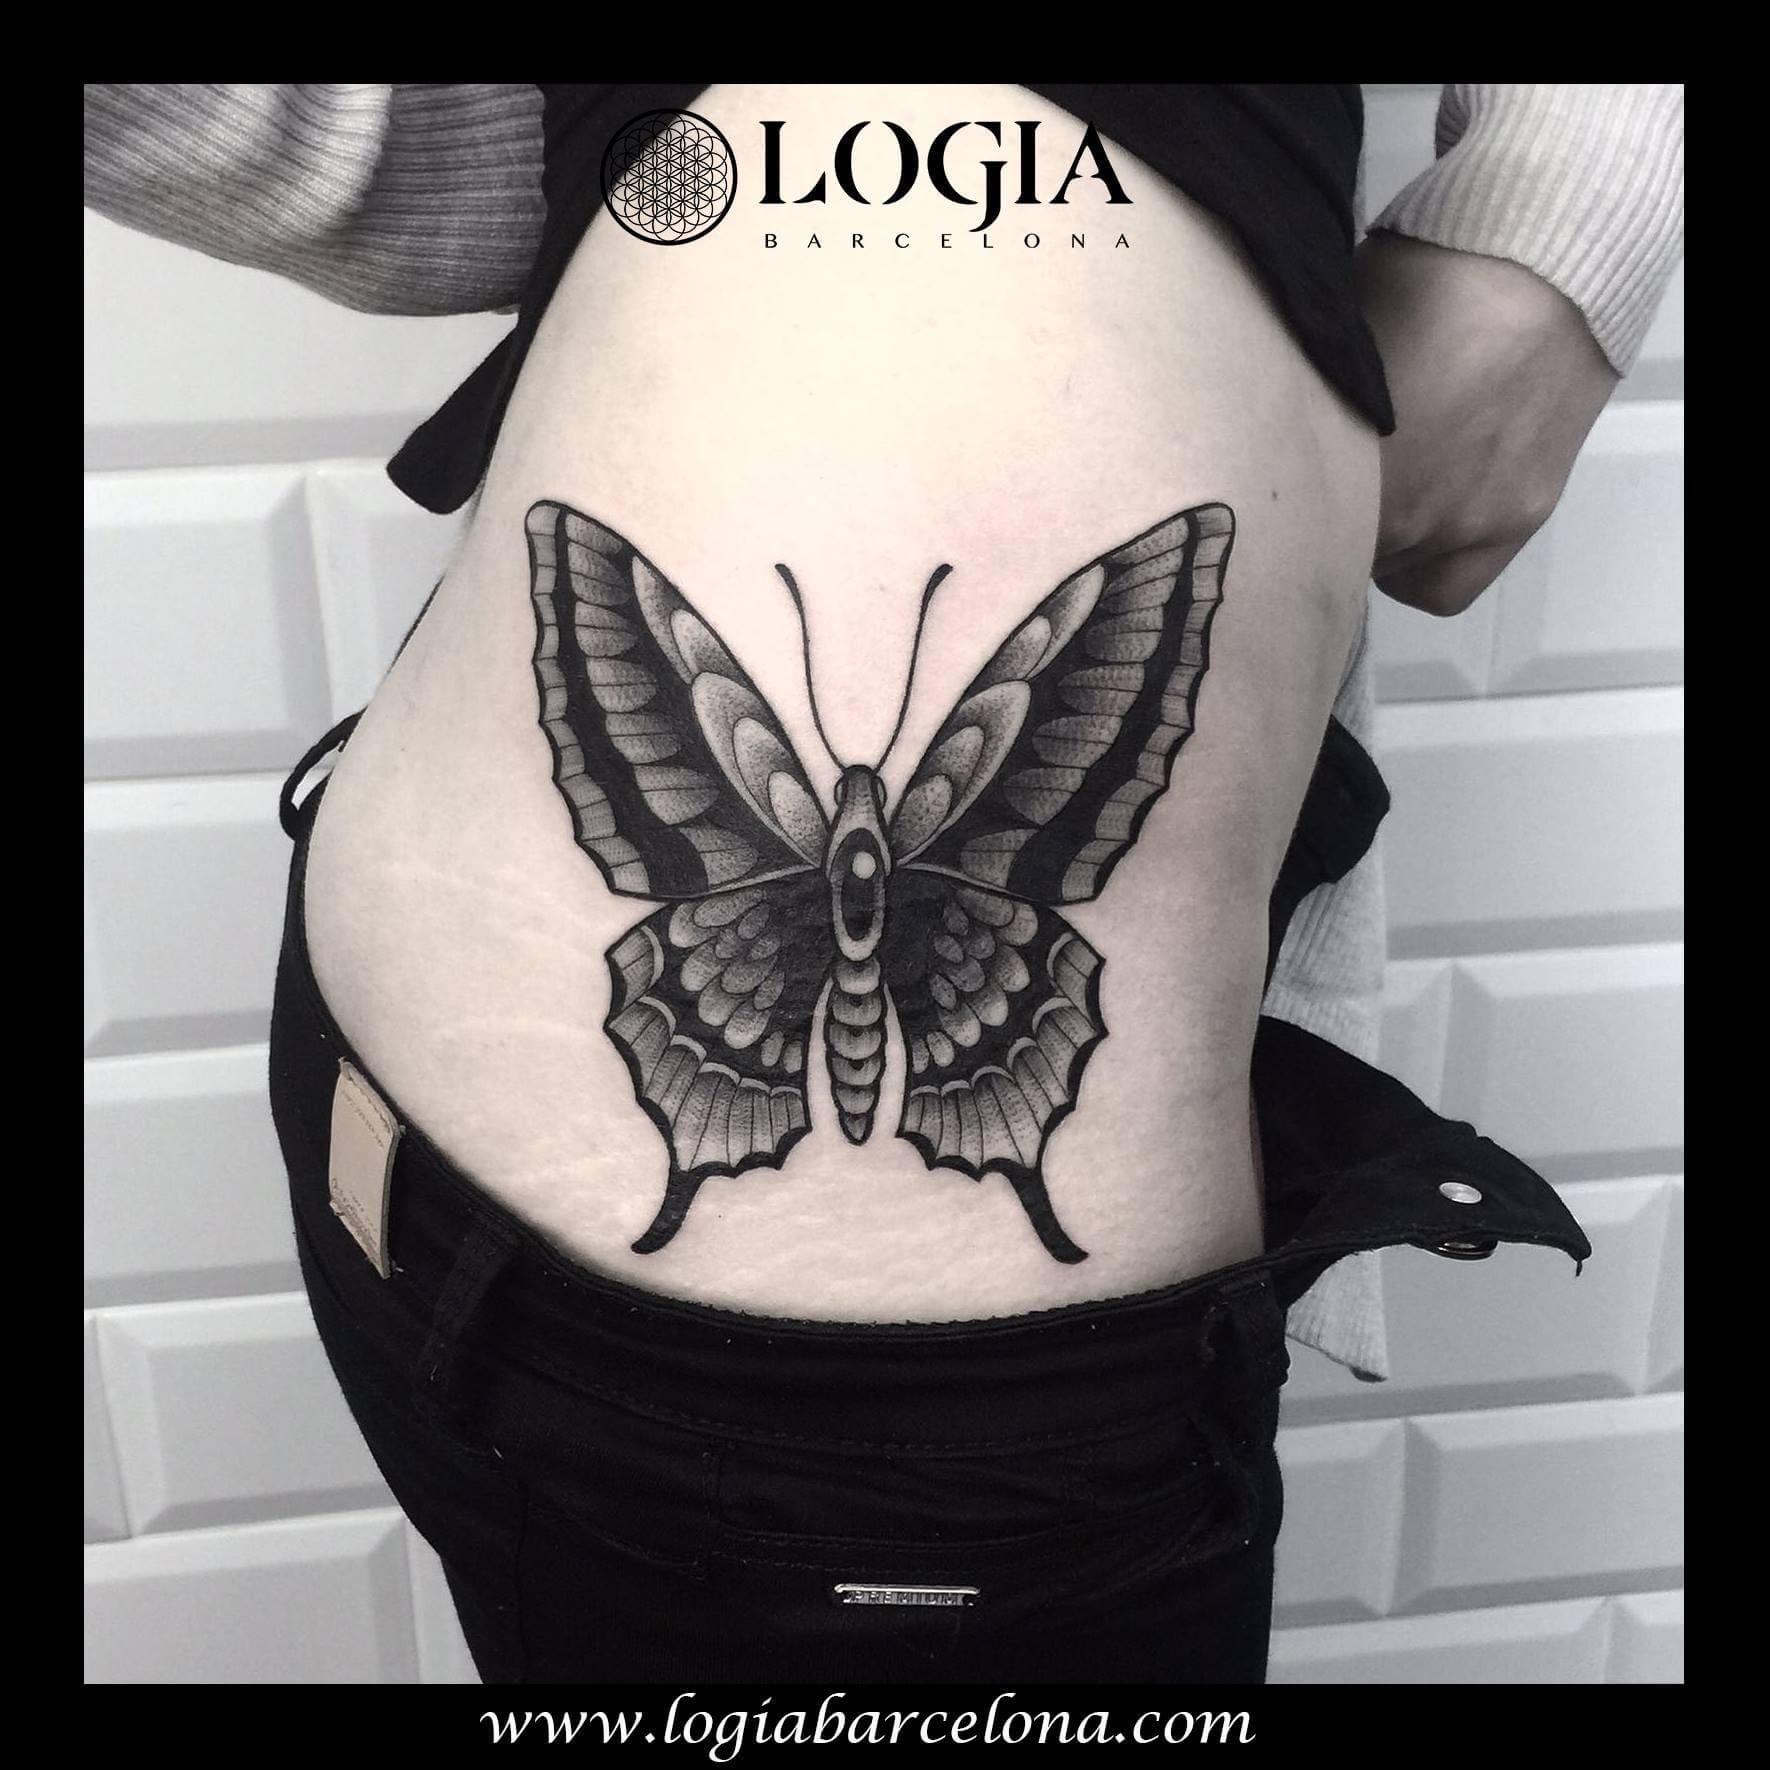 Tatuajes y autoestima